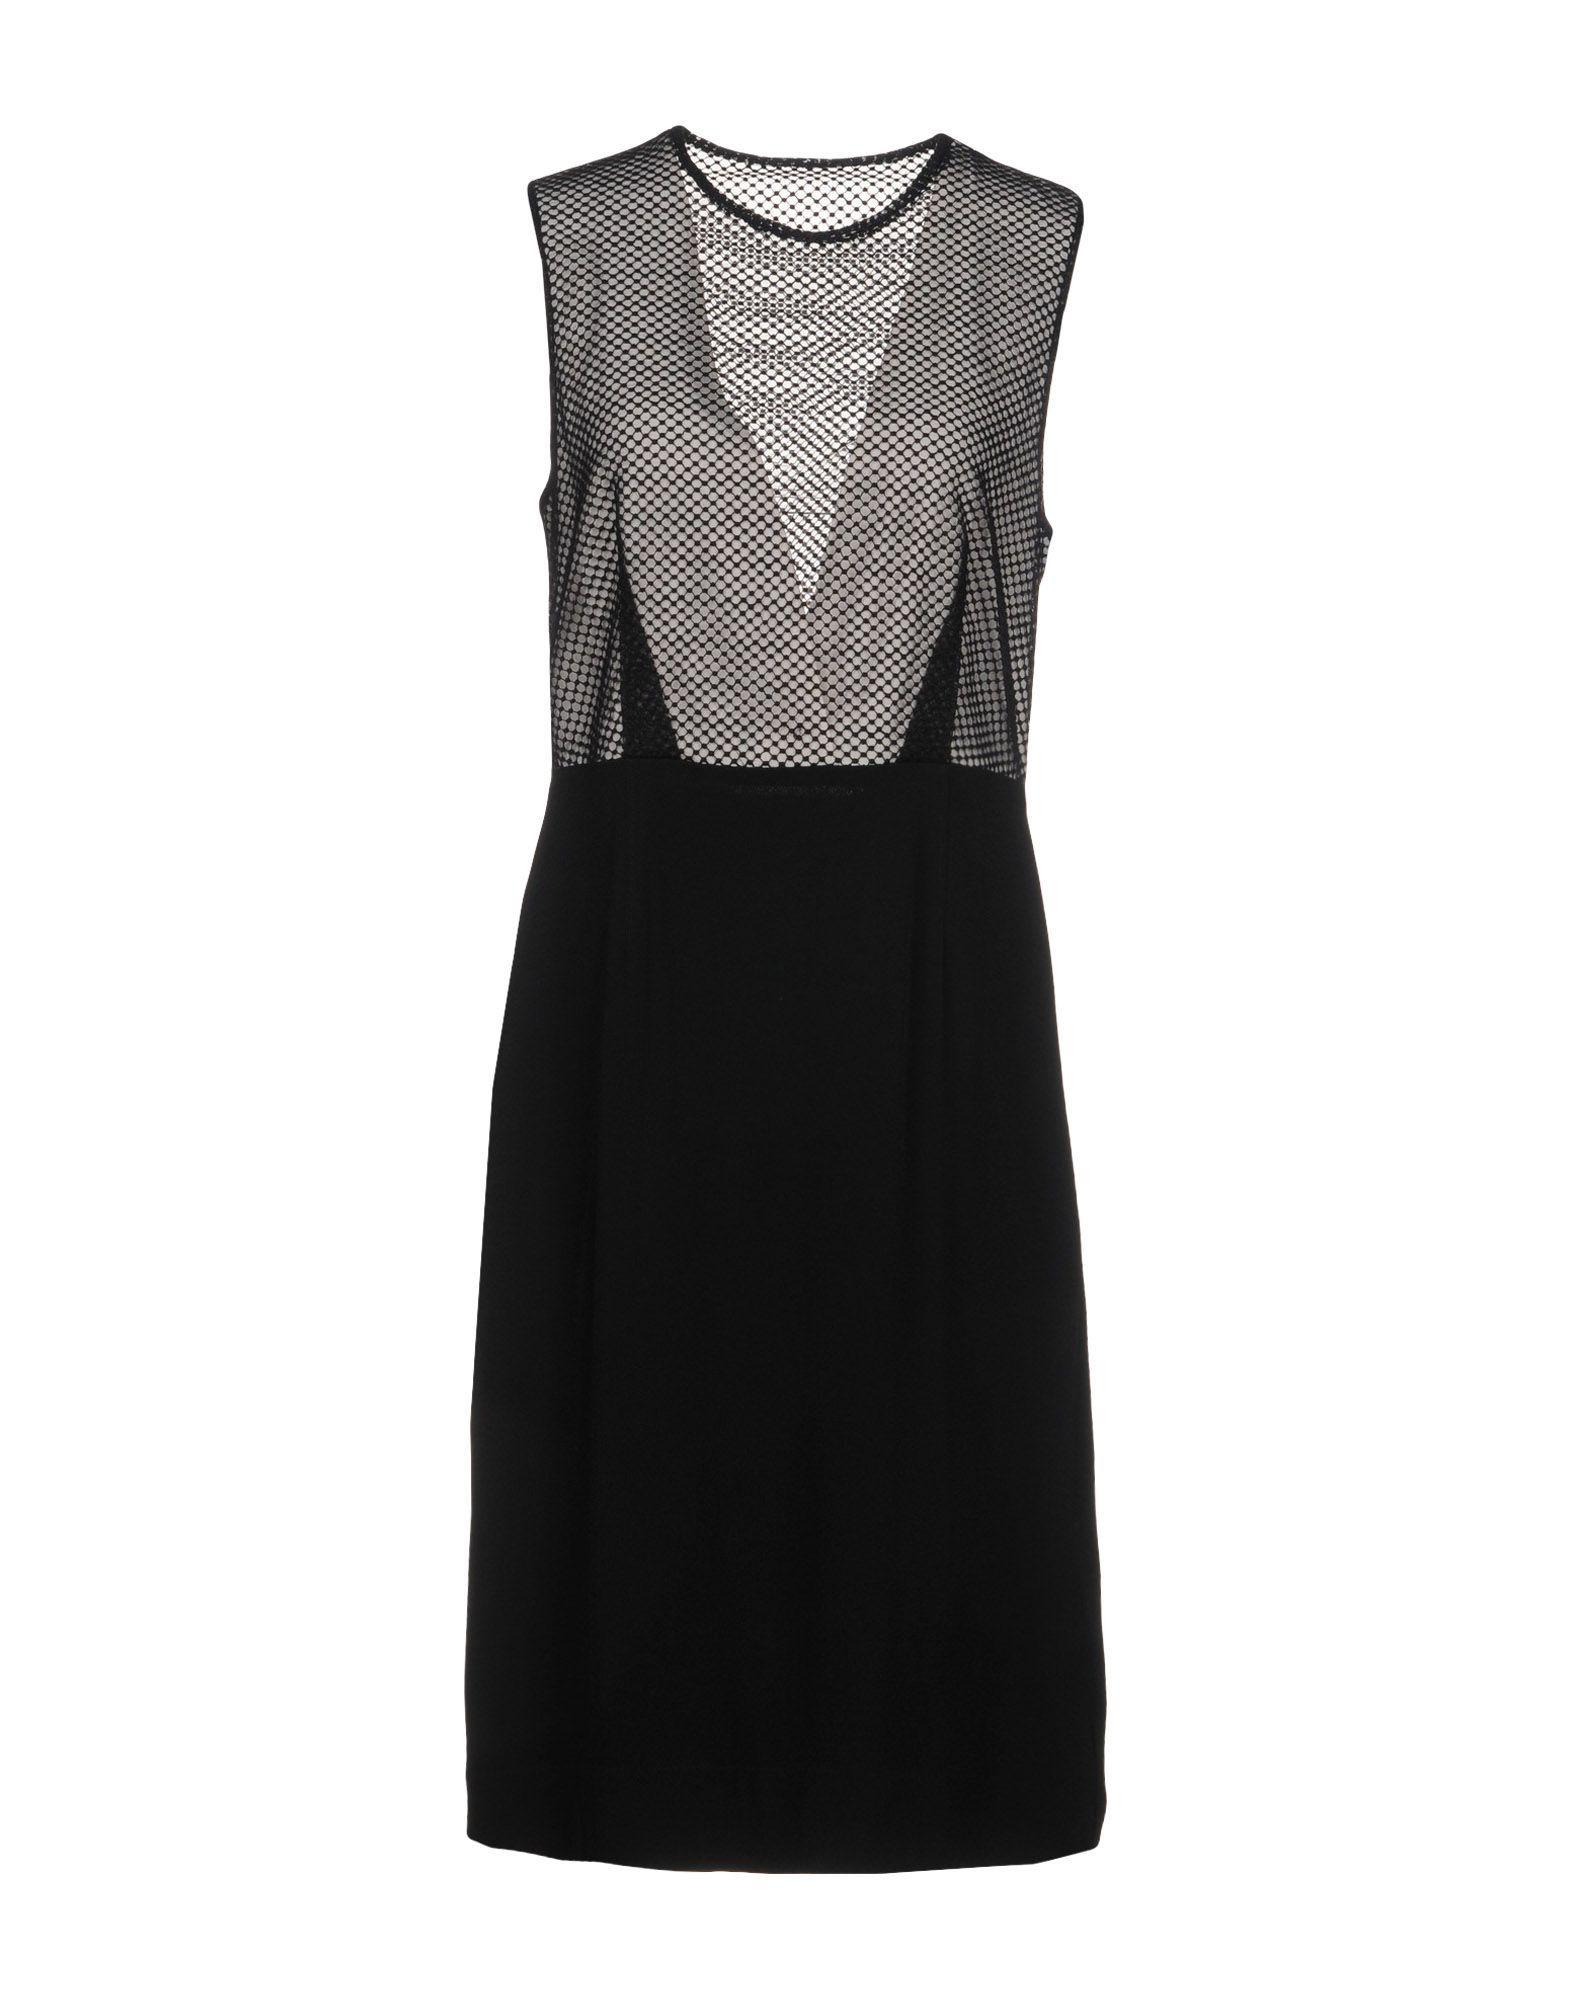 DRESSES By Malene Birger Black Woman Viscose